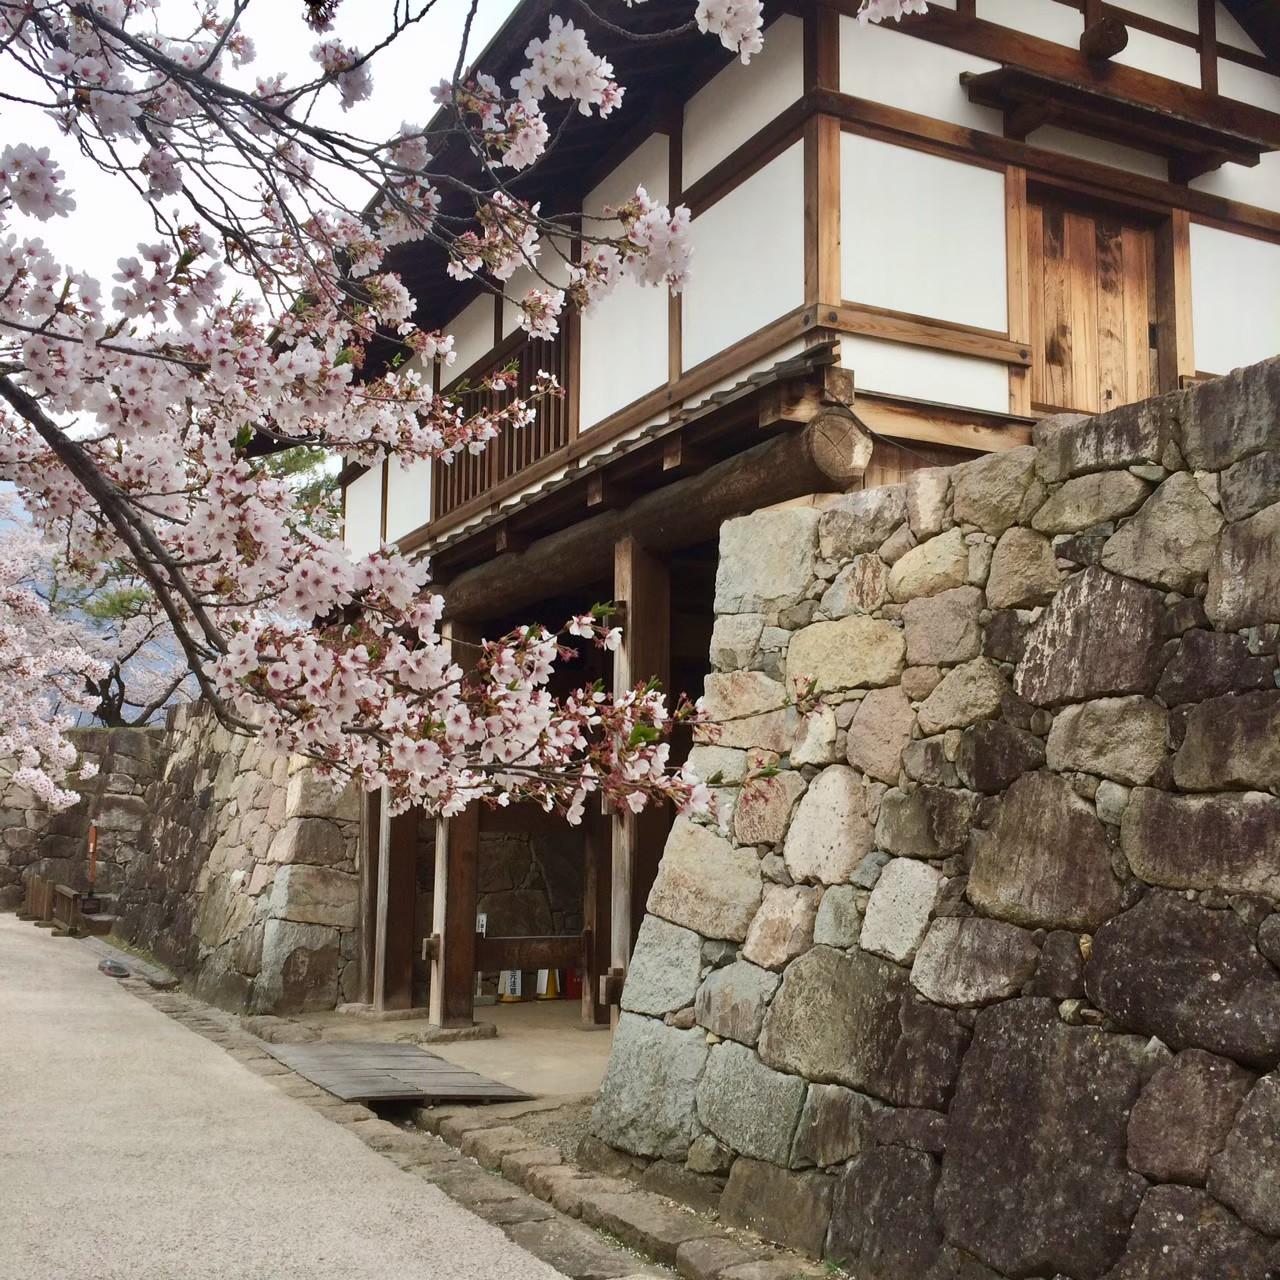 matsushiro-castle-park